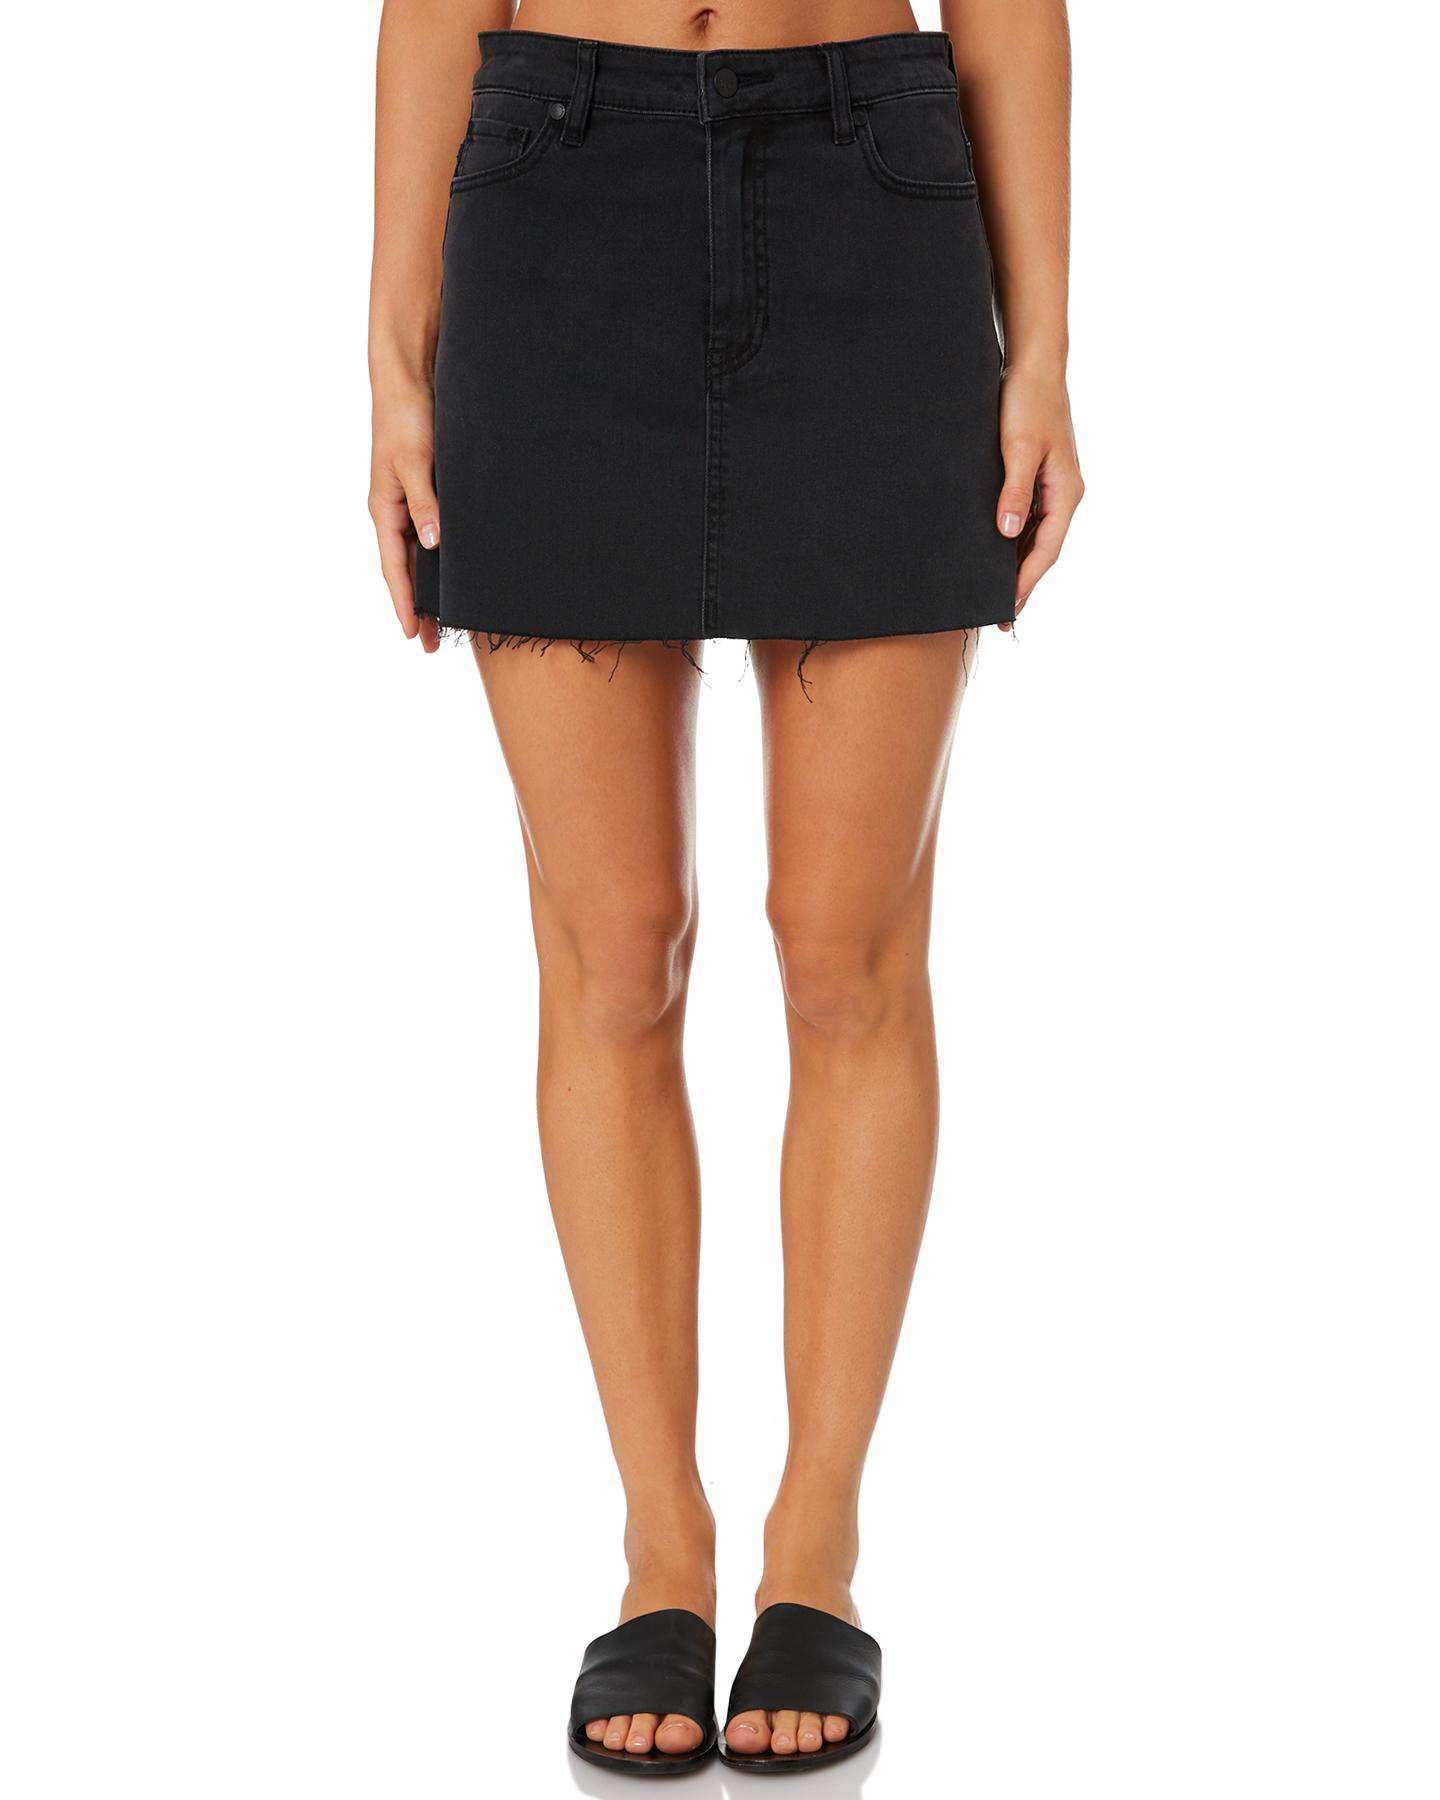 Lee Lola Womens Skirt Lunar Black